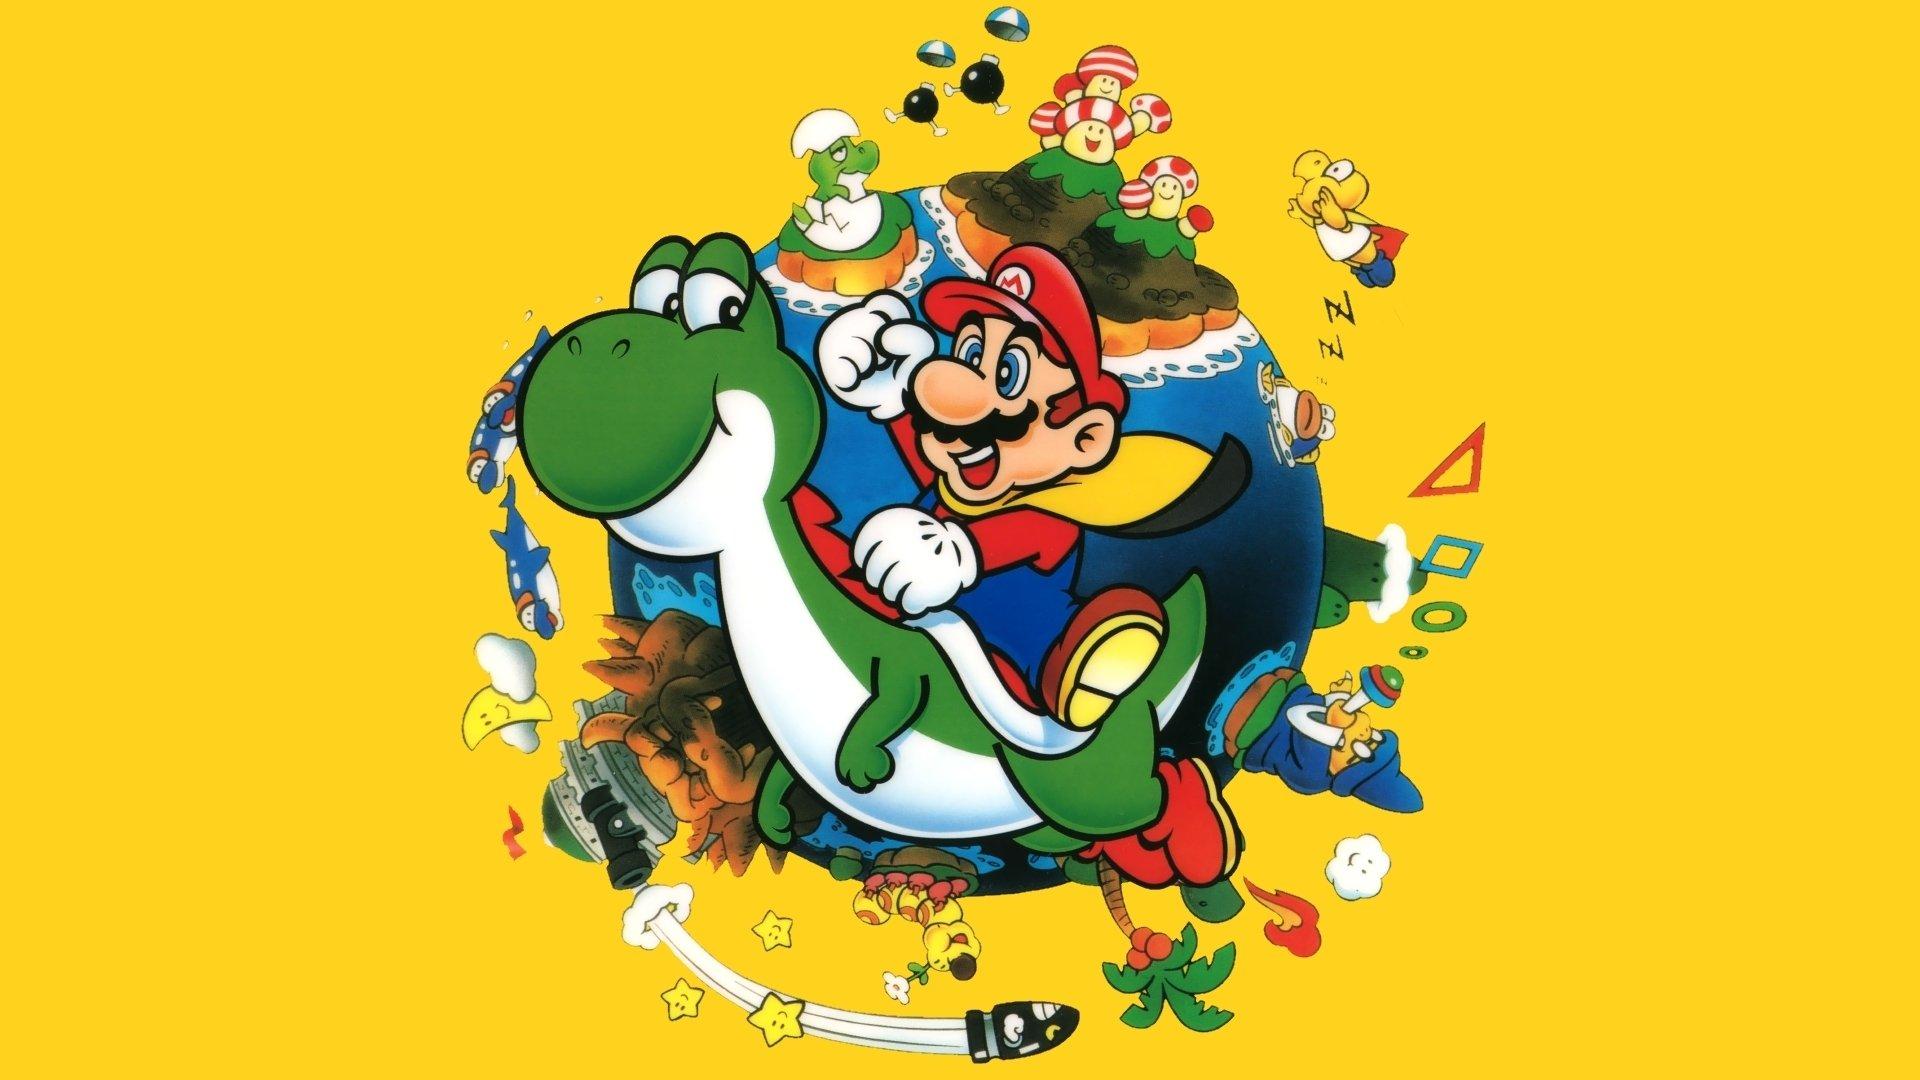 2. Super Mario World -